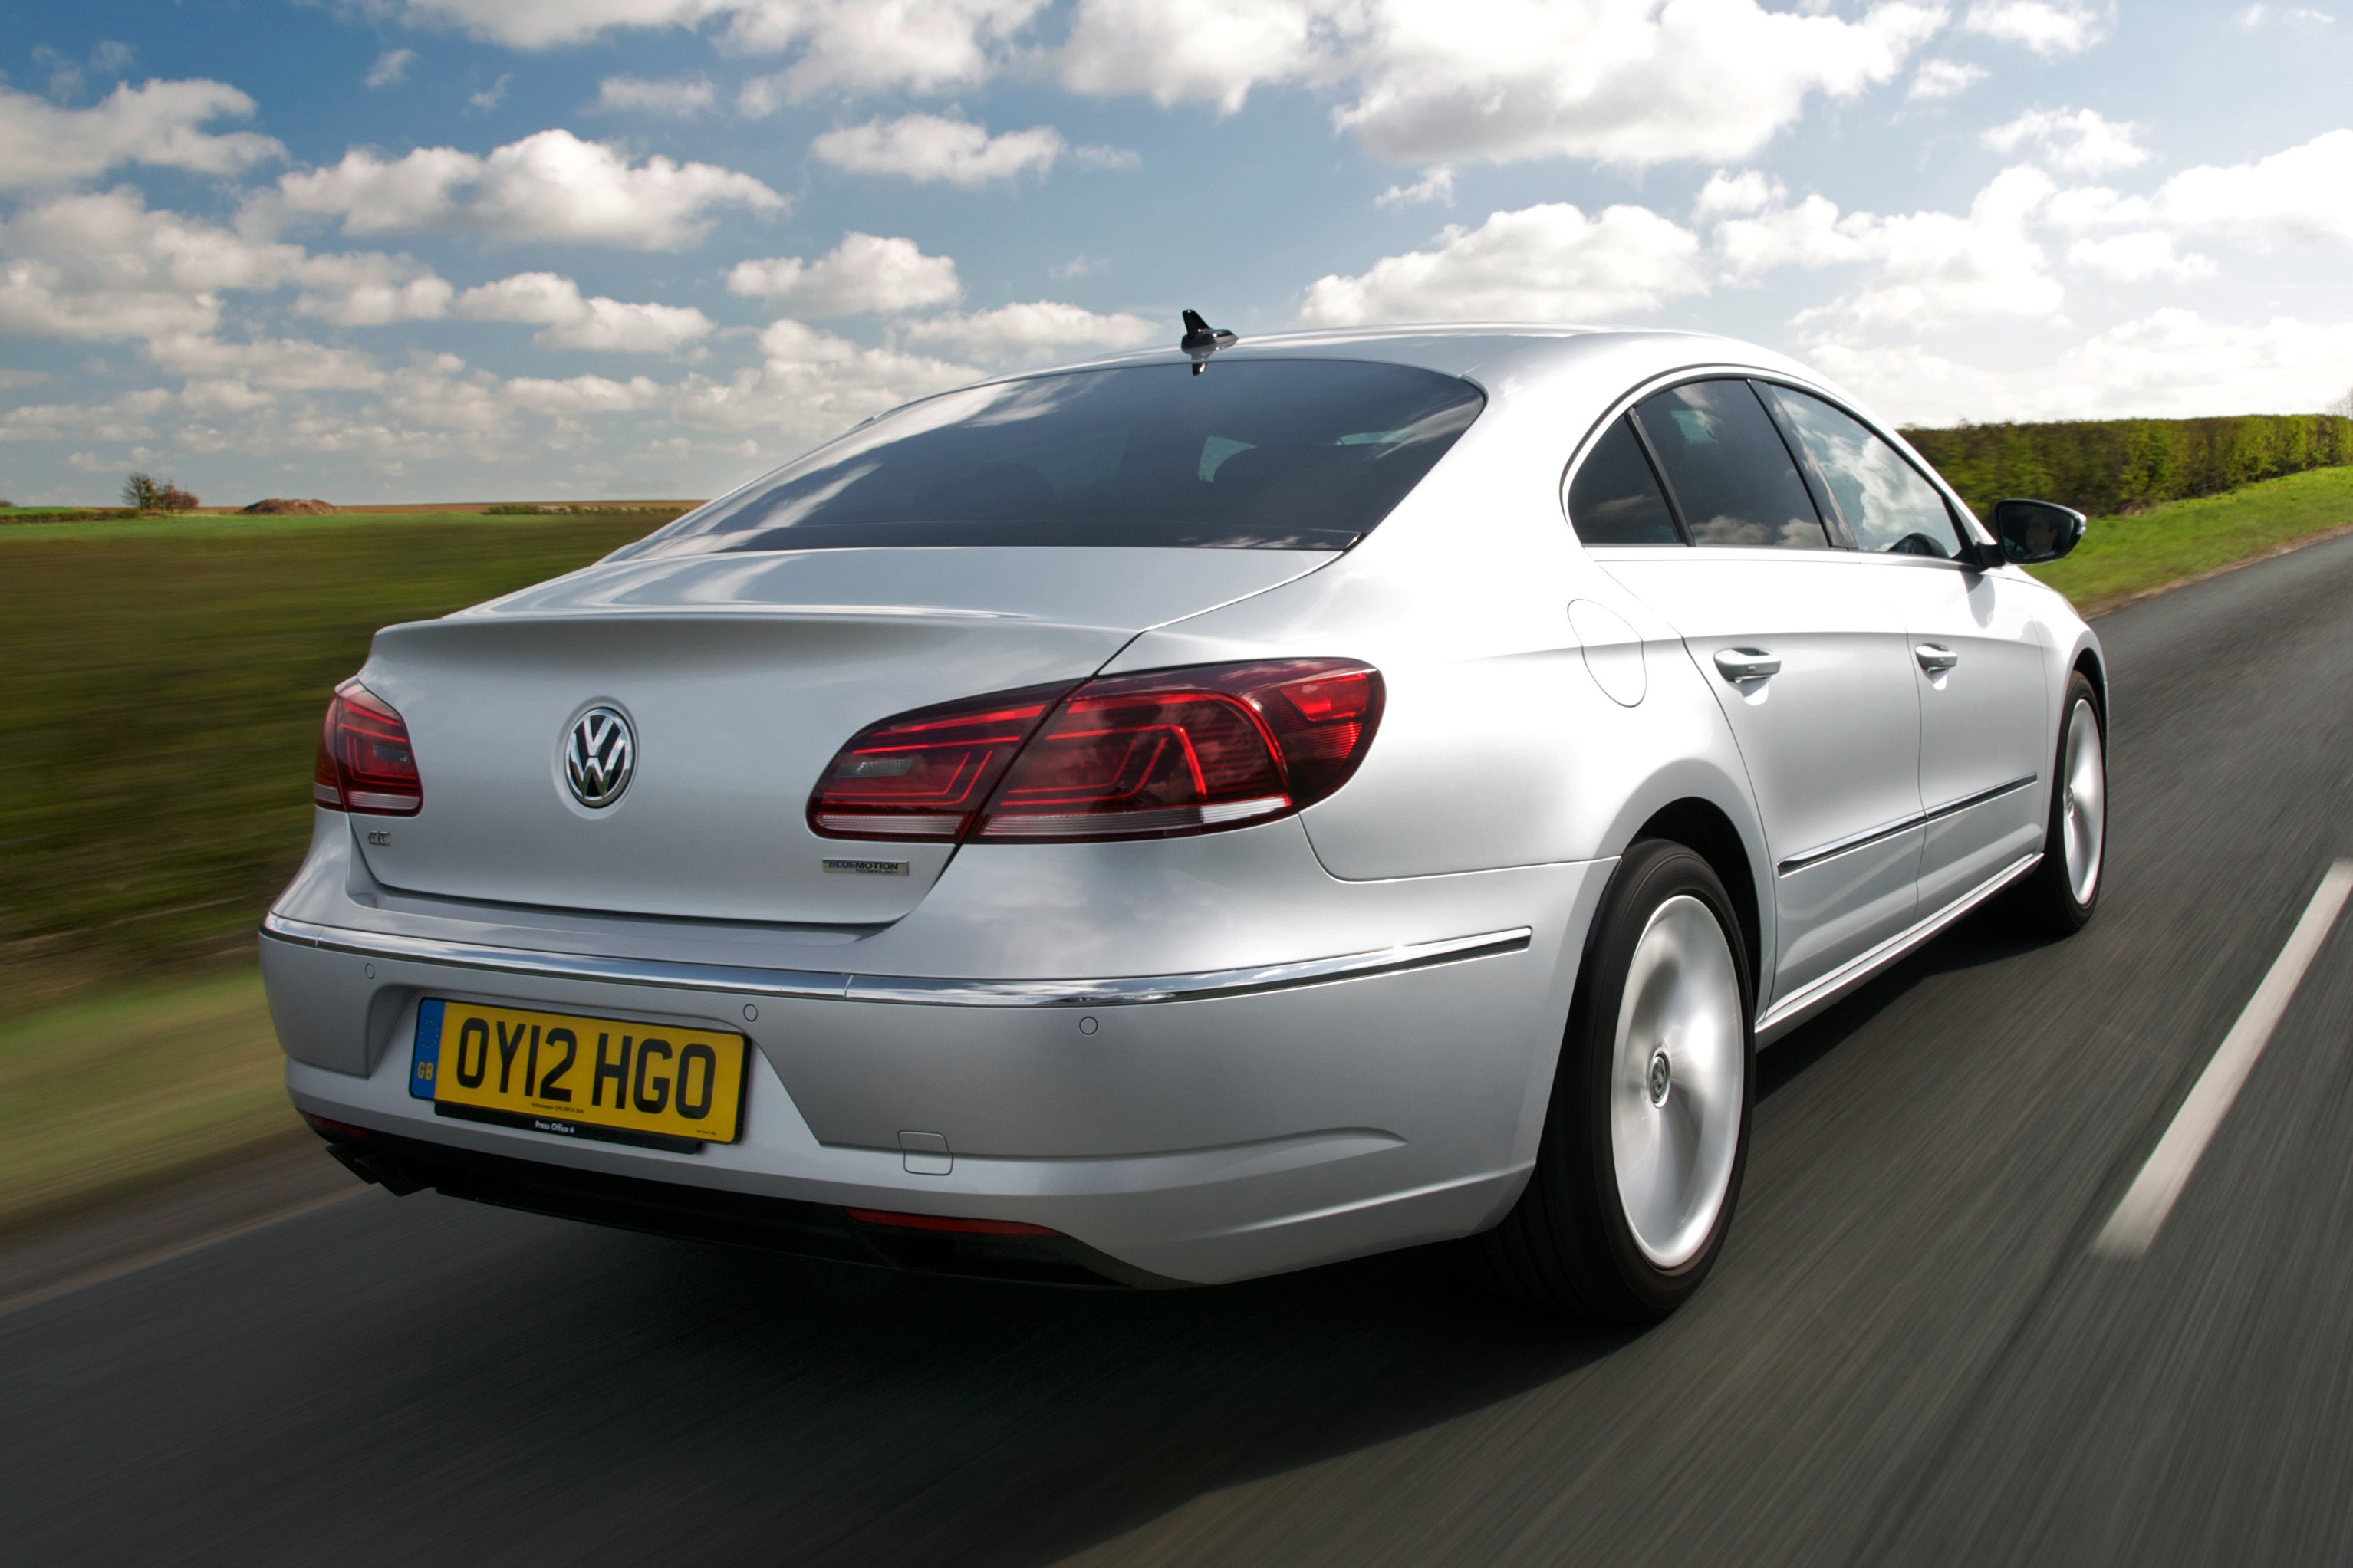 Volkswagen CC Rear Side View